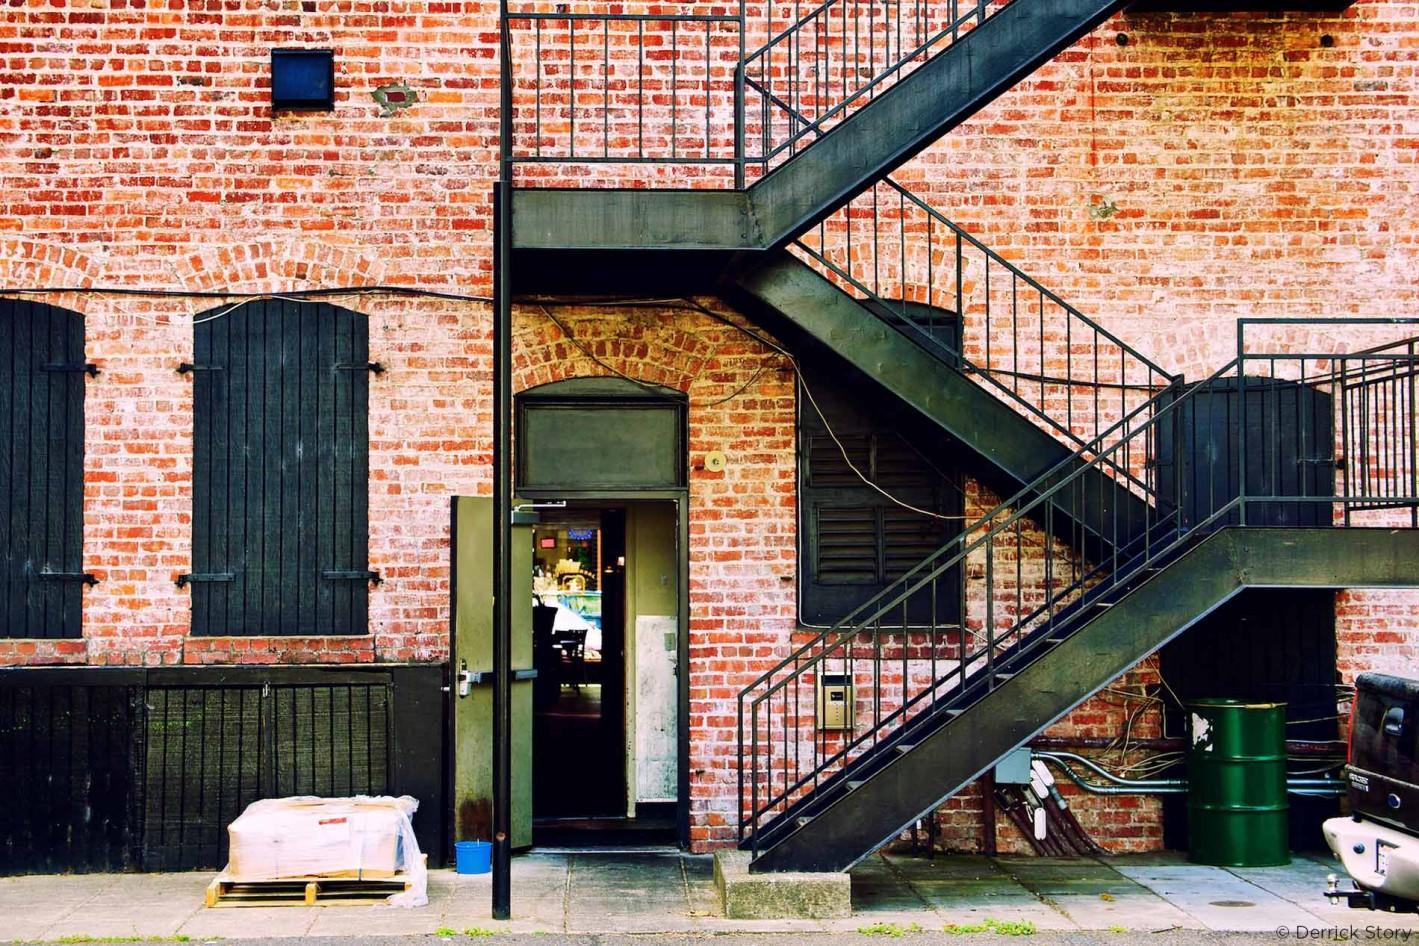 http://thedigitalstory.com/2016/04/07/P8075103-bricks-n-stairs1900-1-1419x946.jpg